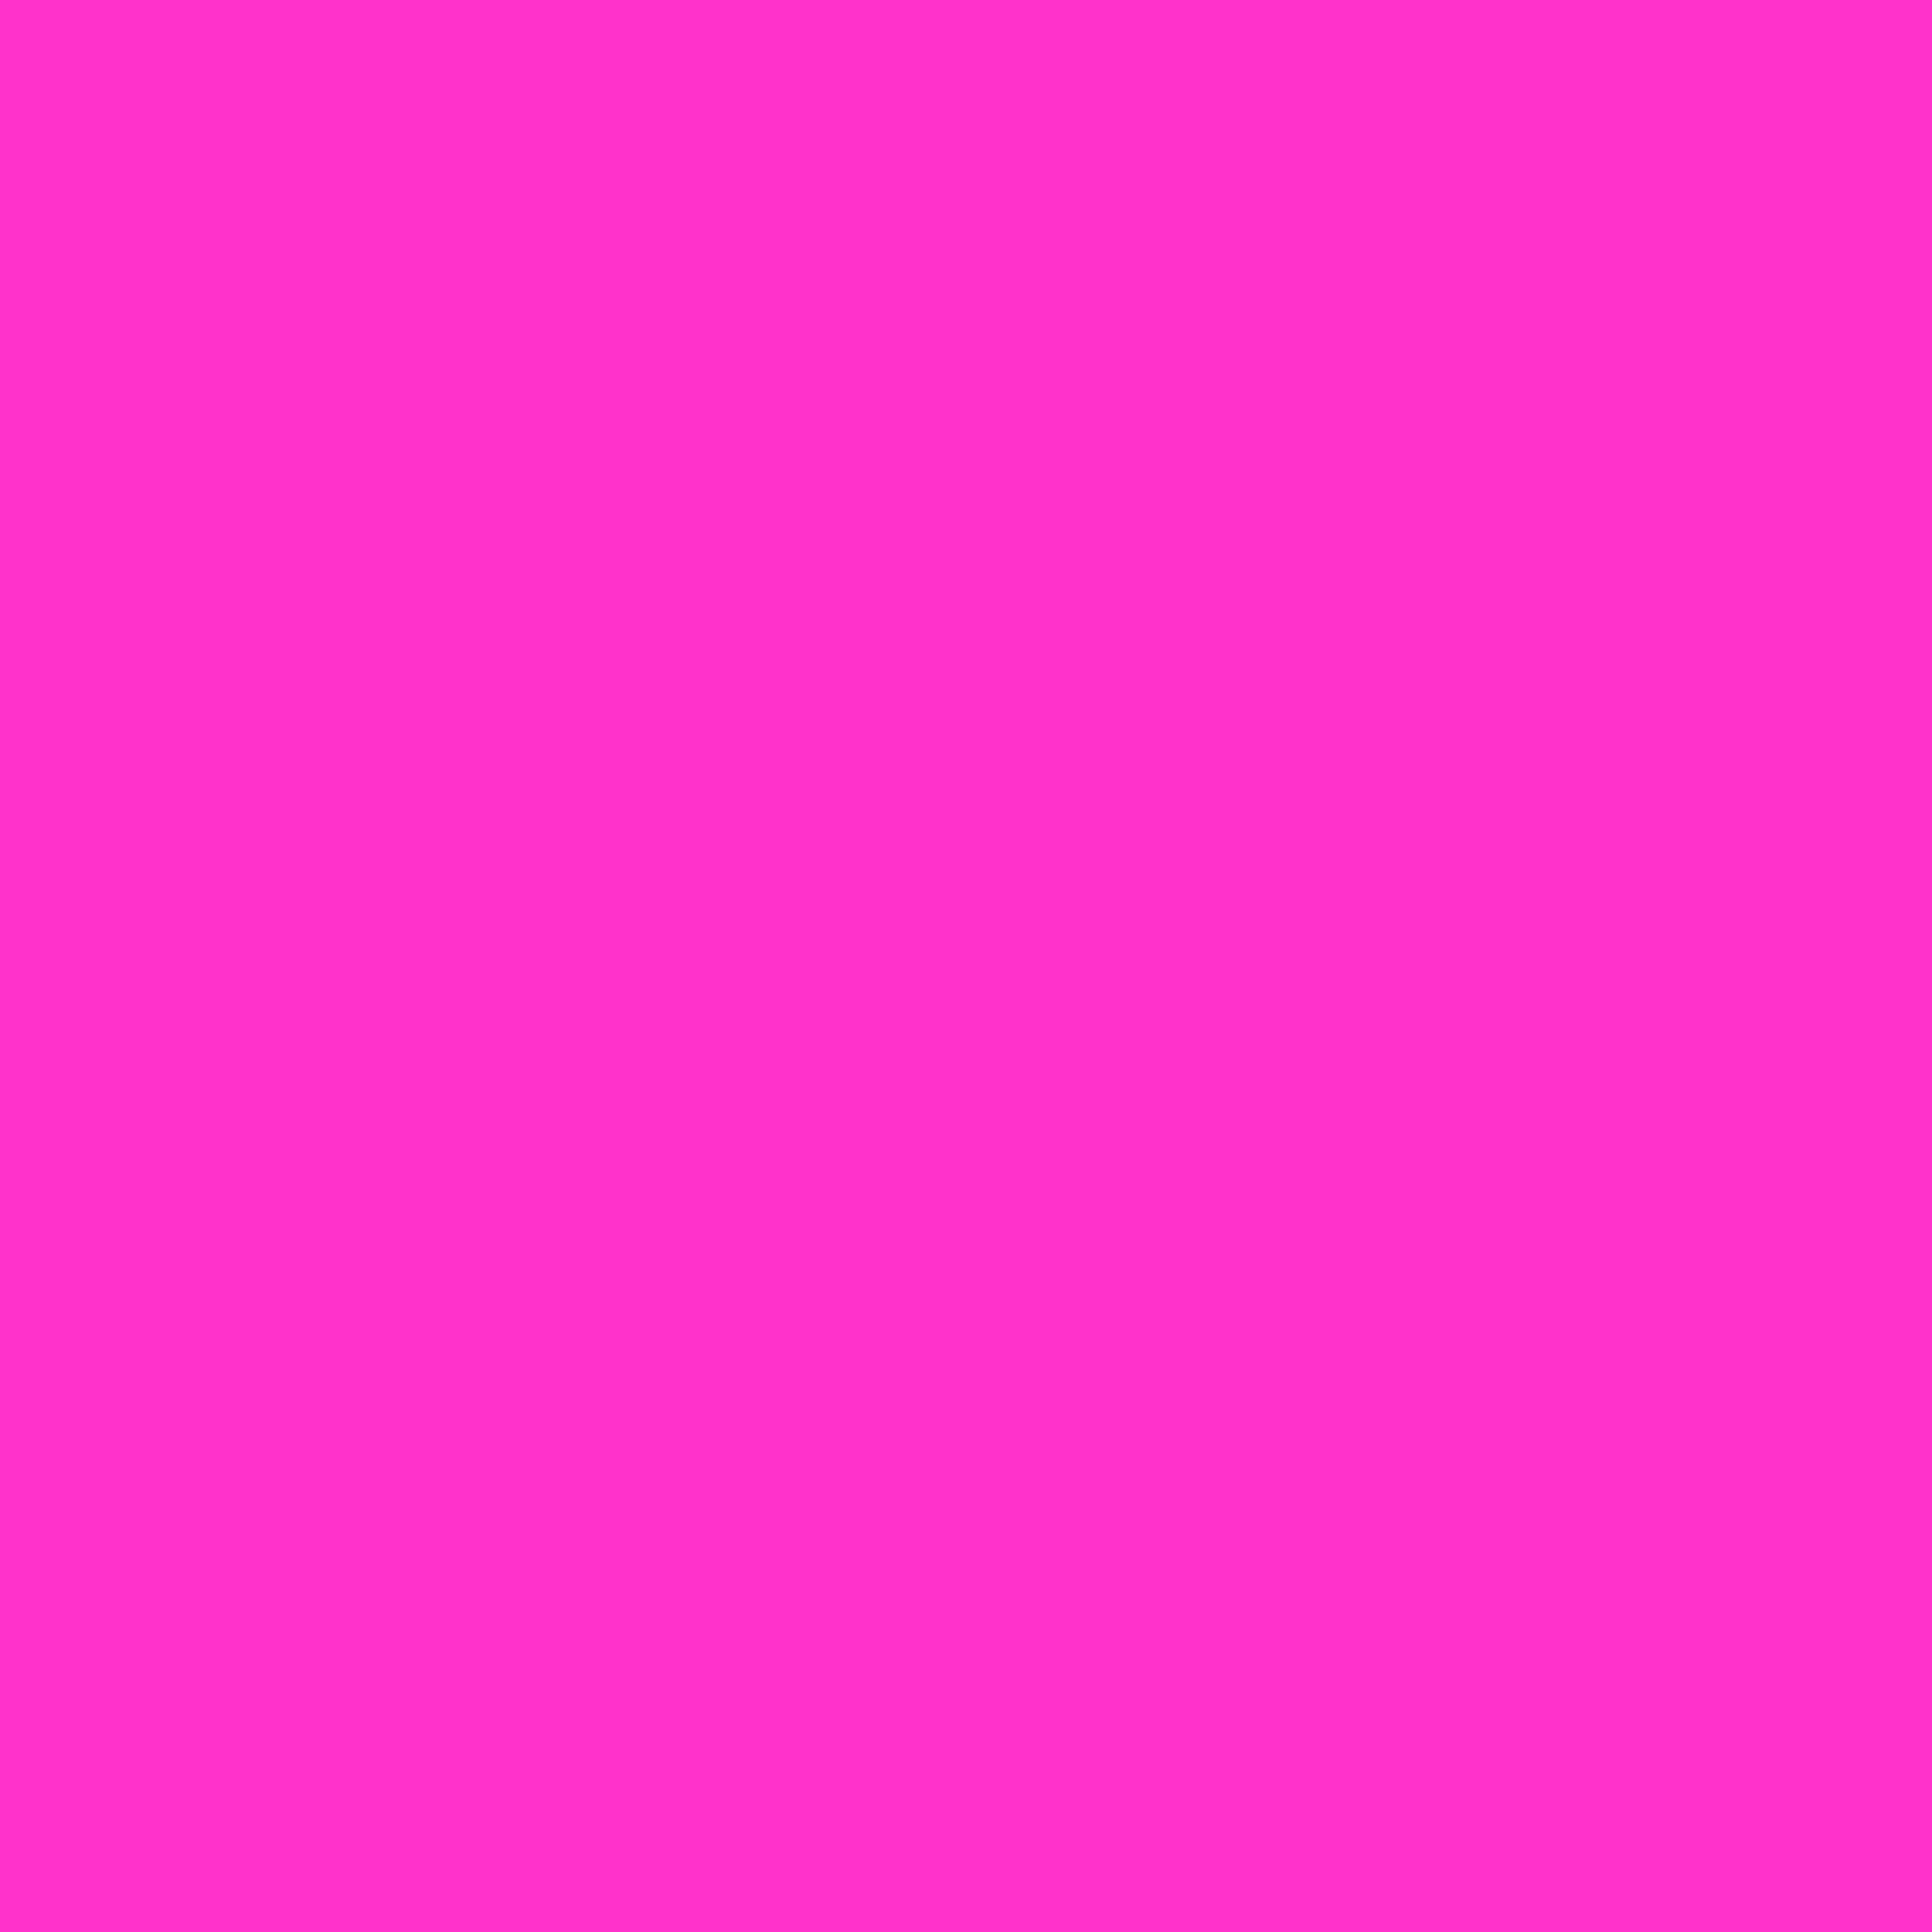 2732x2732 Razzle Dazzle Rose Solid Color Background